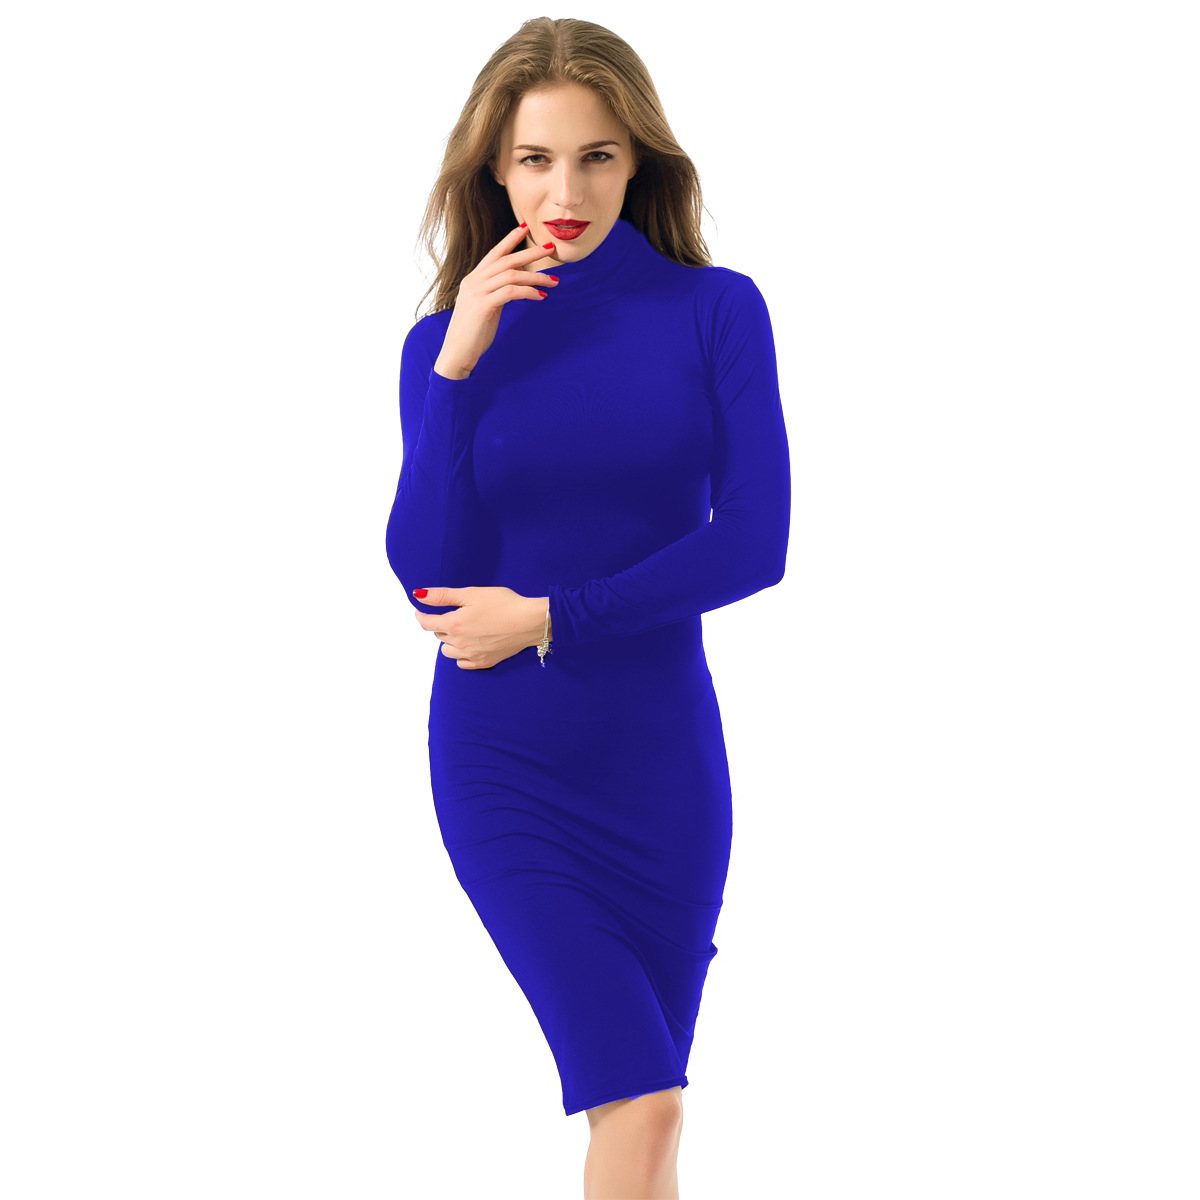 VD8046 blue Amazon /wish hot sale